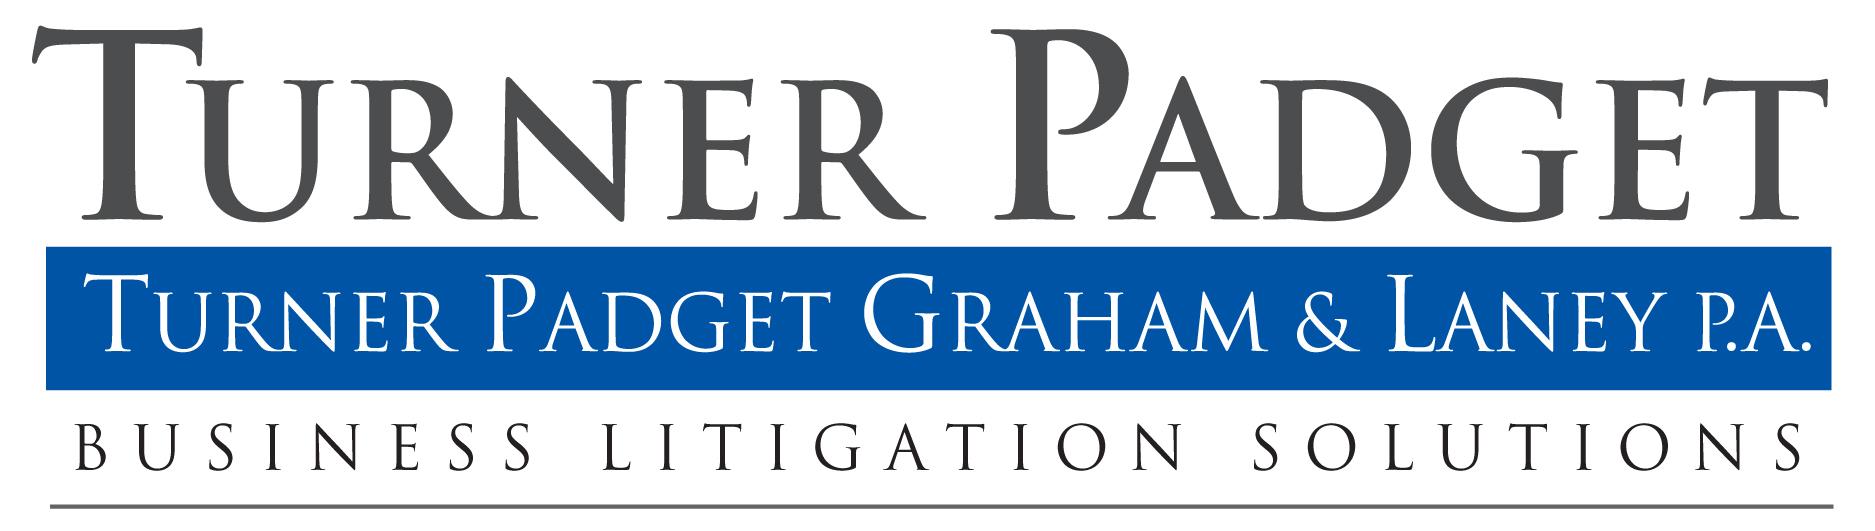 Turner Padget Graham & Laney, P.A.